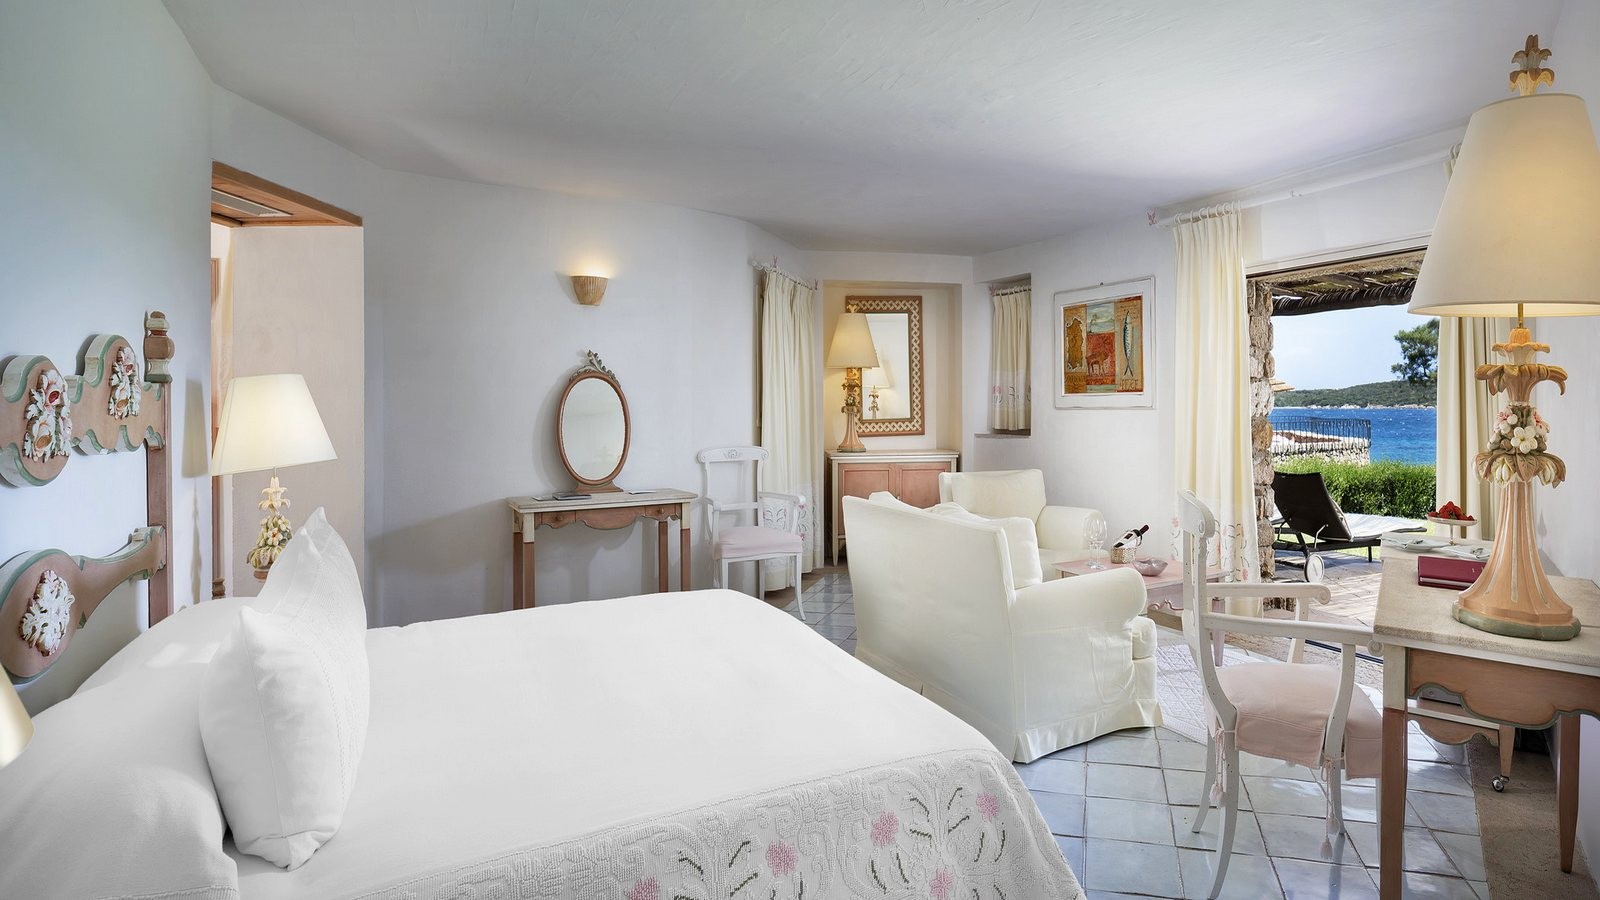 Pitrizza-Hotel-Costa-Smeralda-Room-Premium-Bedroom